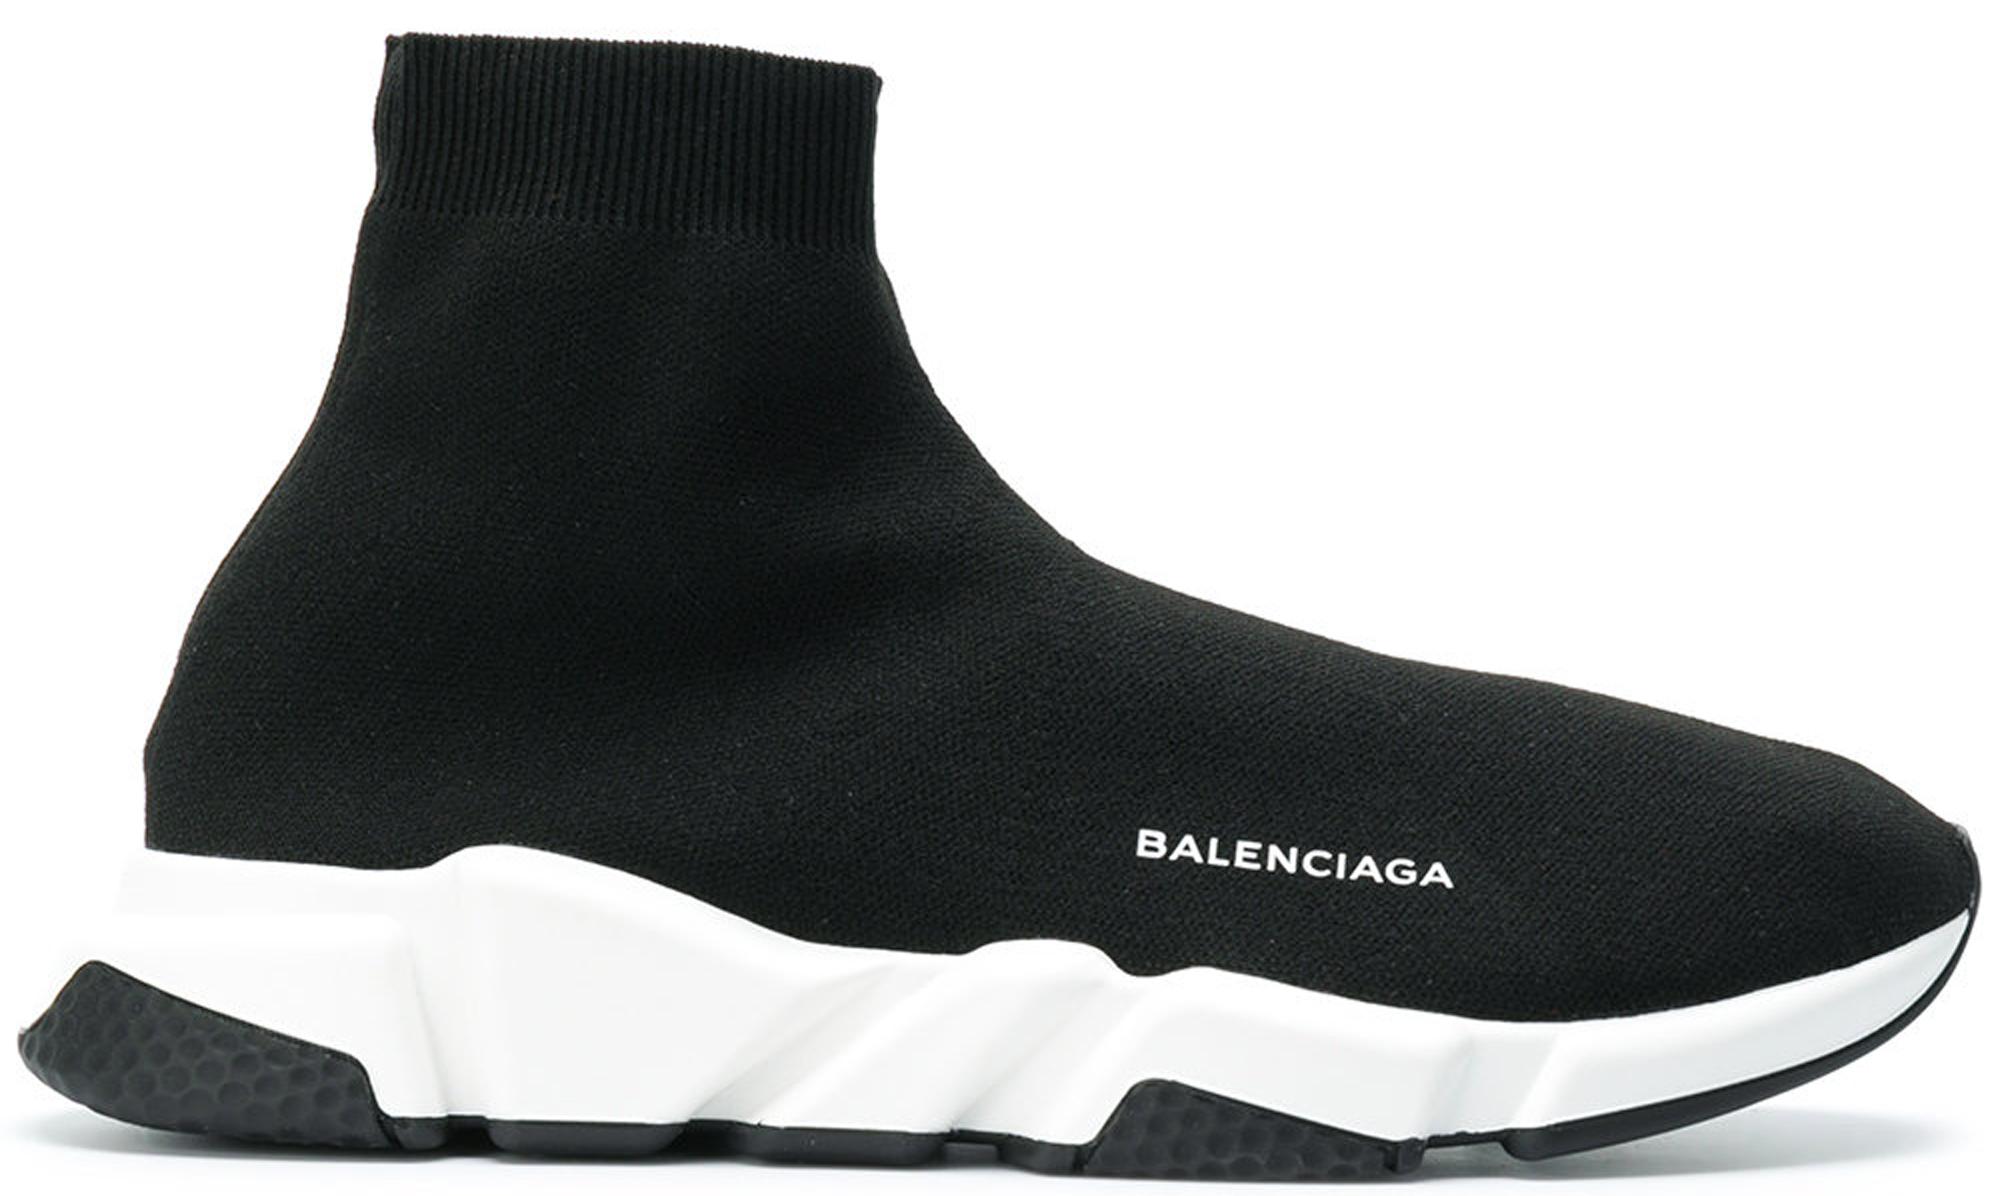 Balenciaga Speed Trainer Black White (2018)